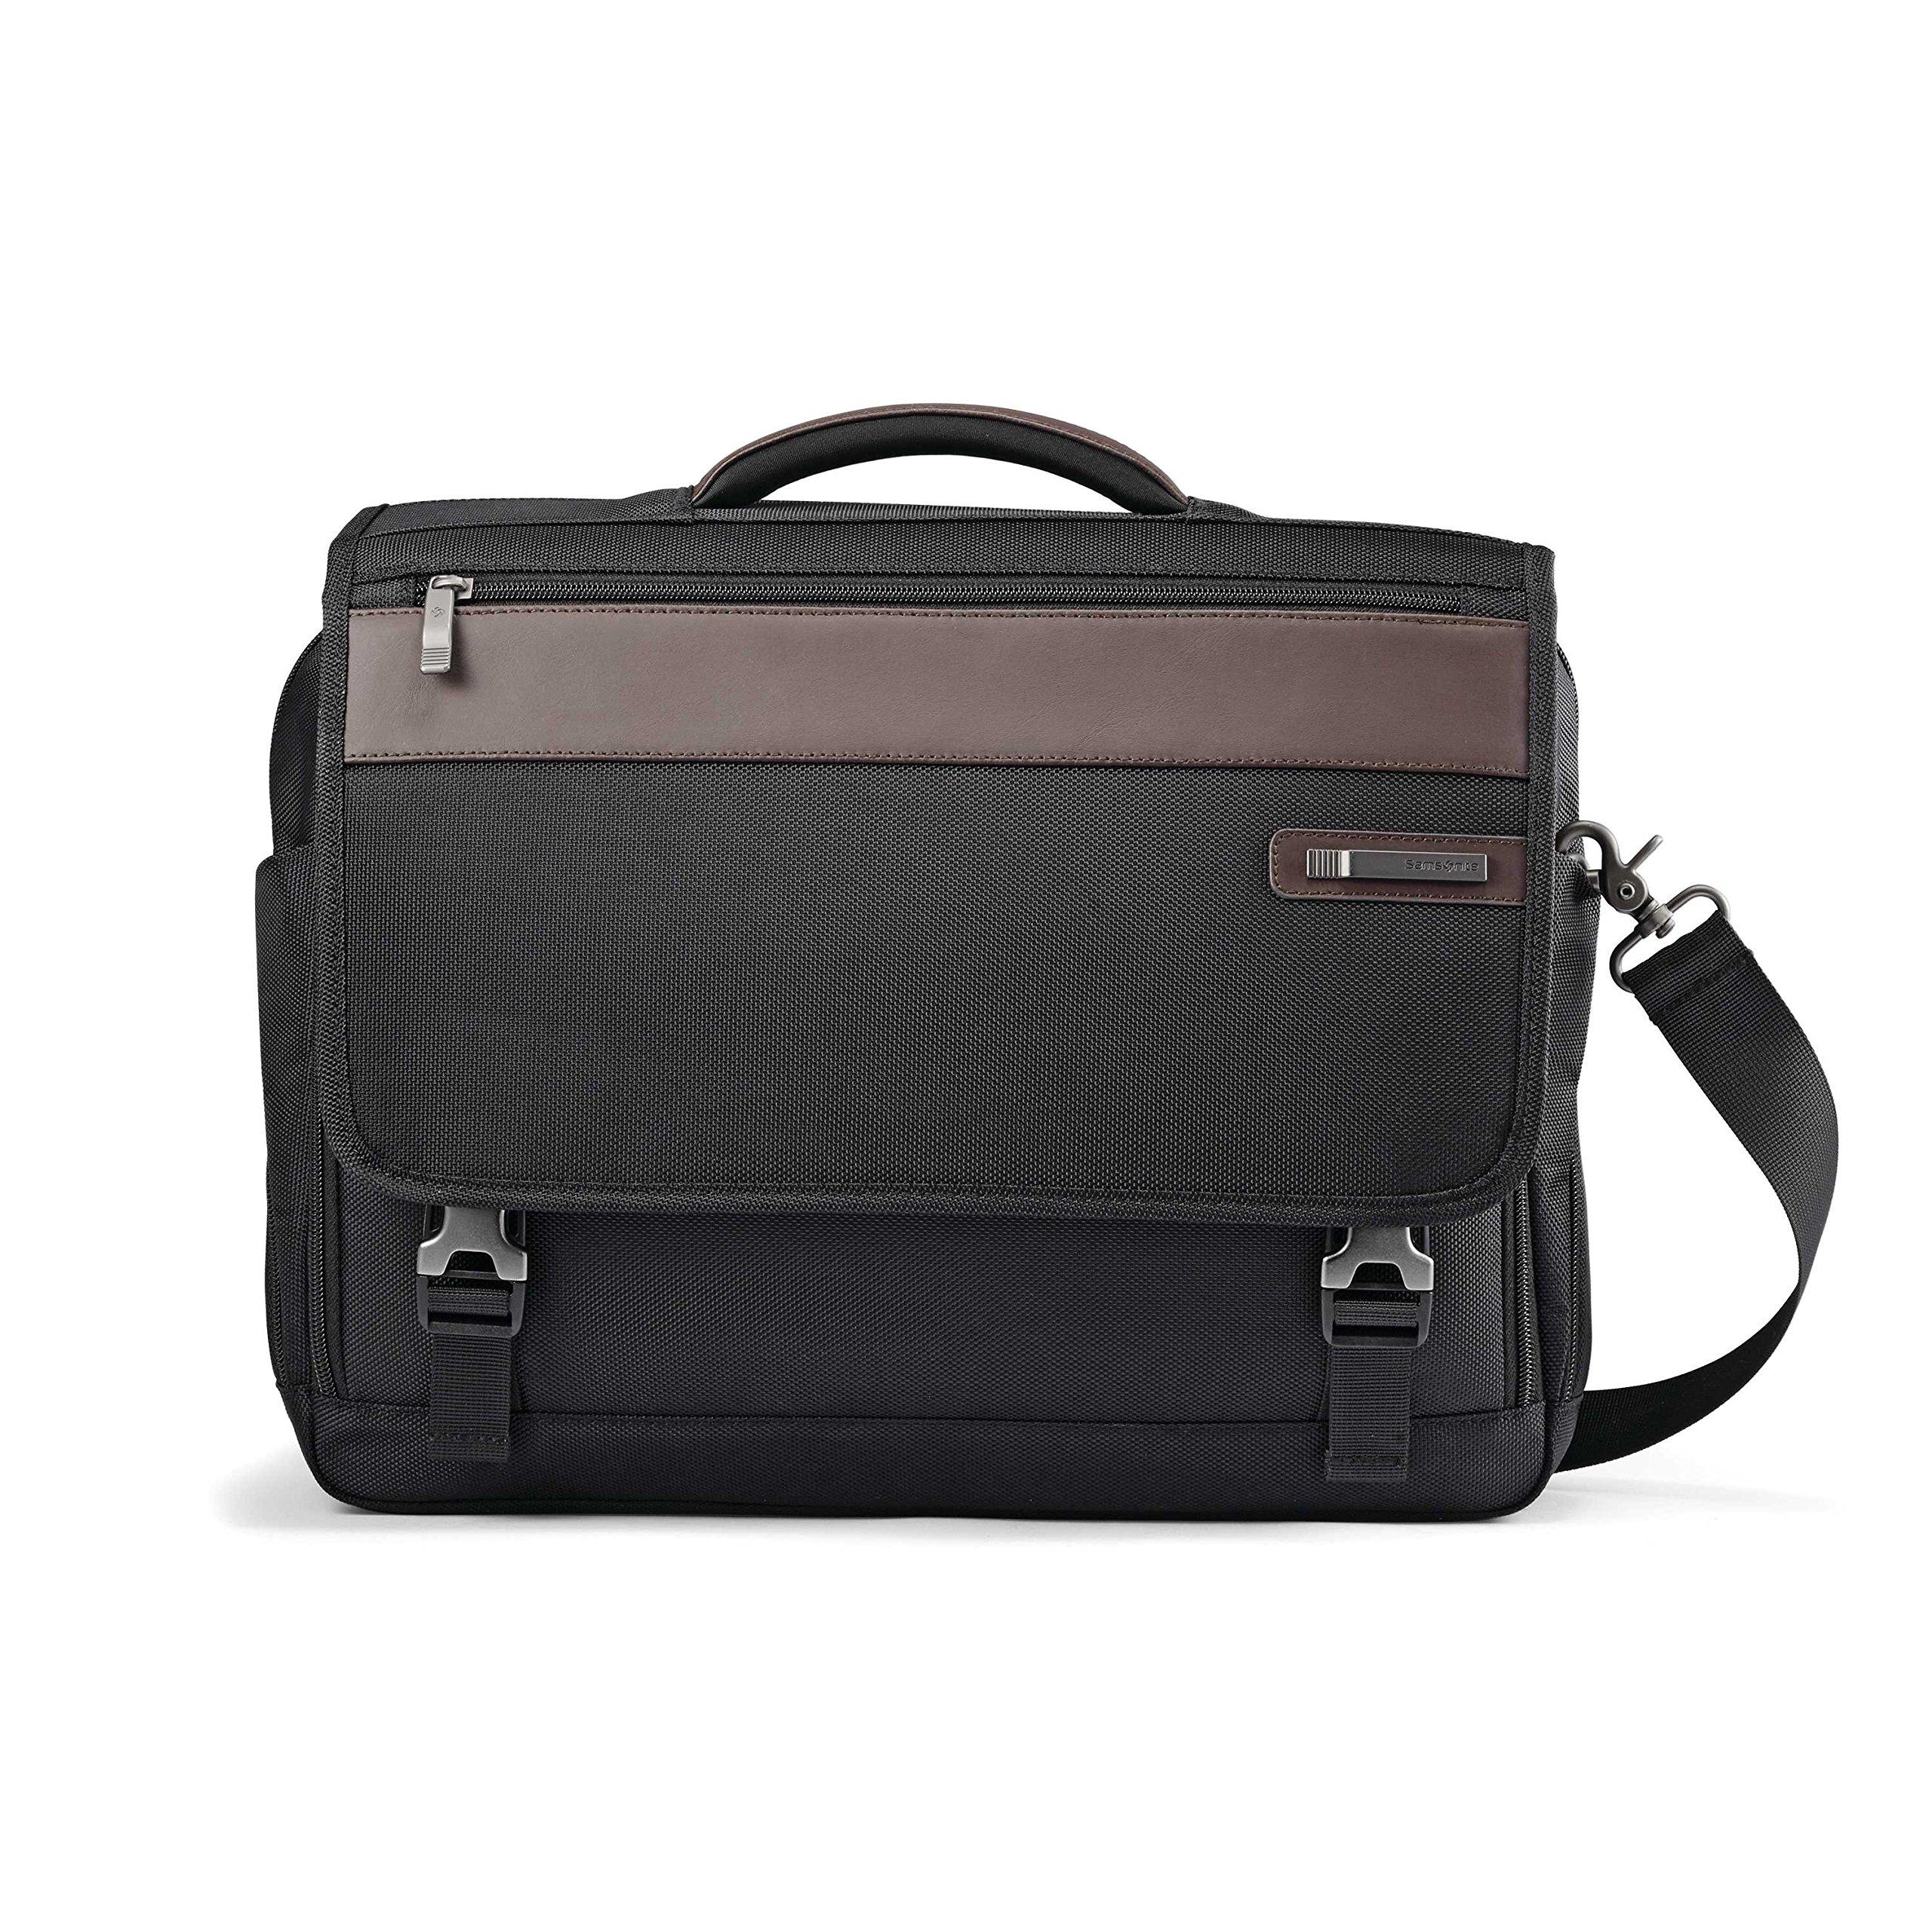 Samsonite Kombi Flapover Briefcase, Black/Brown by Samsonite (Image #2)